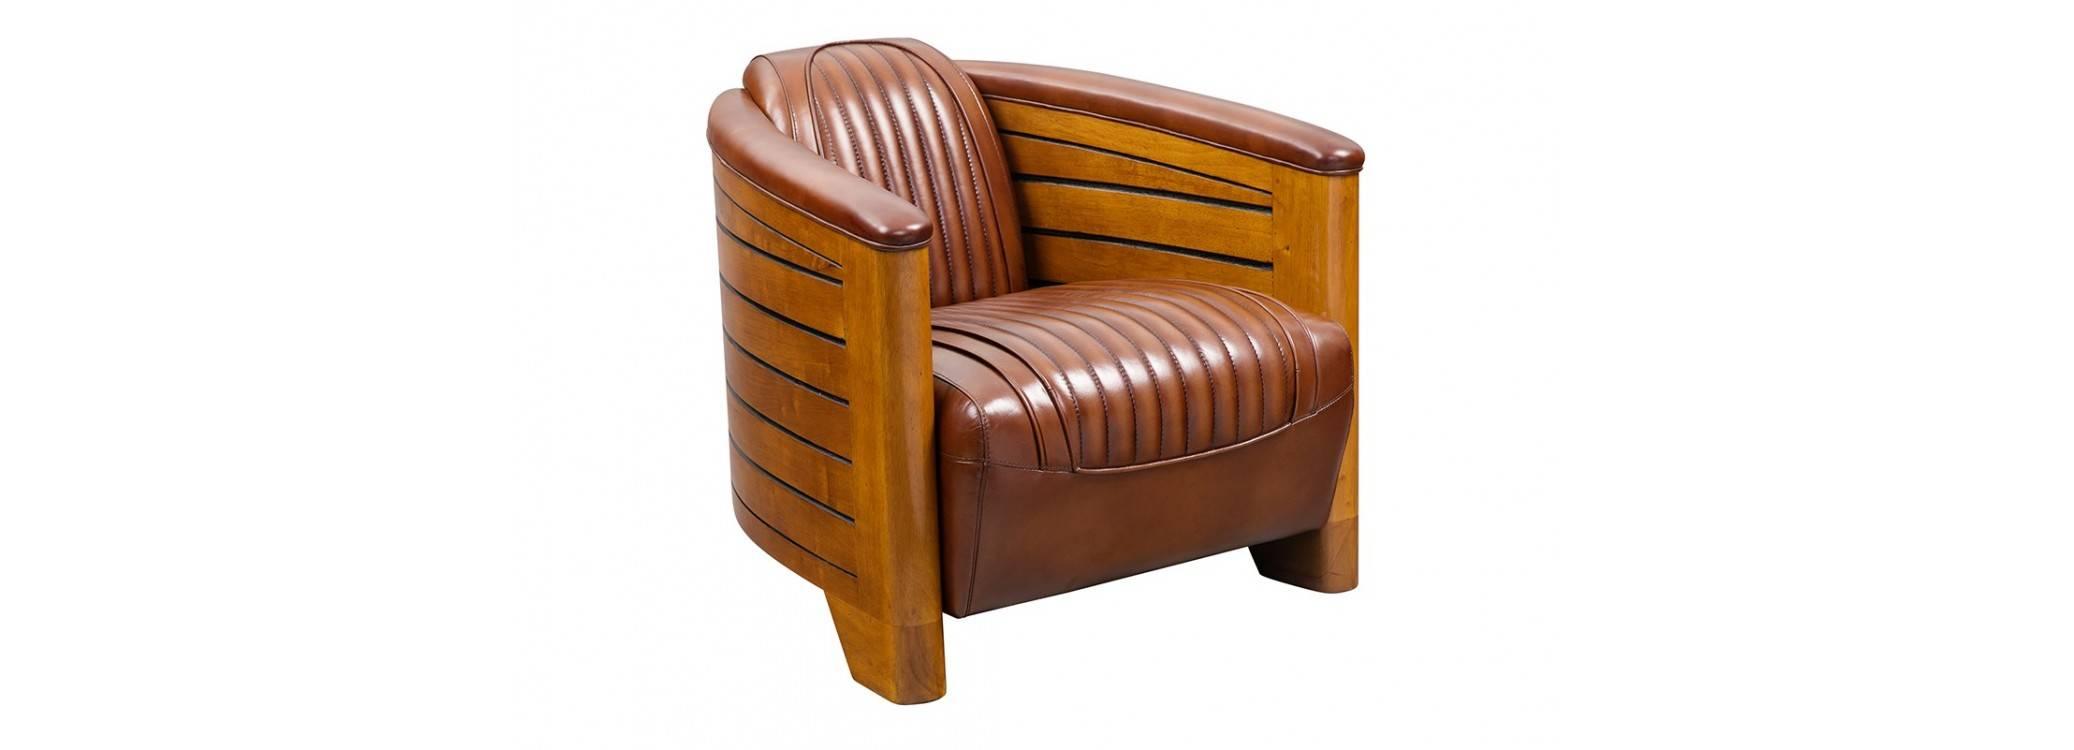 Fauteuil club Pirogue cuir vintage